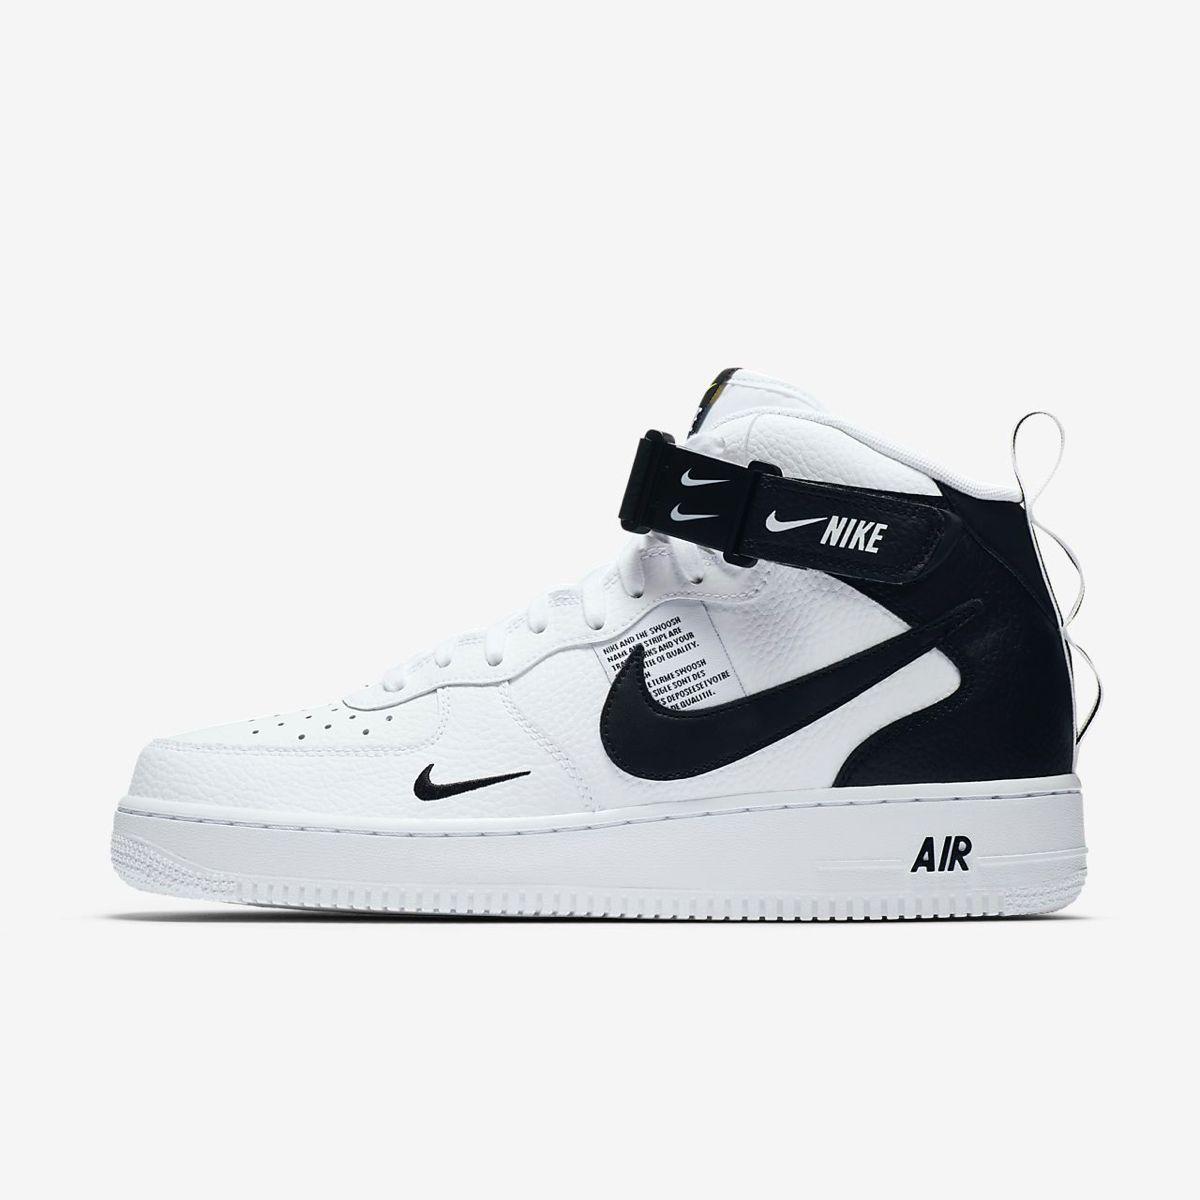 Nike Air Force 1 07 Mid Lv8 Men S Shoe Nike Au スニーカー メンズ